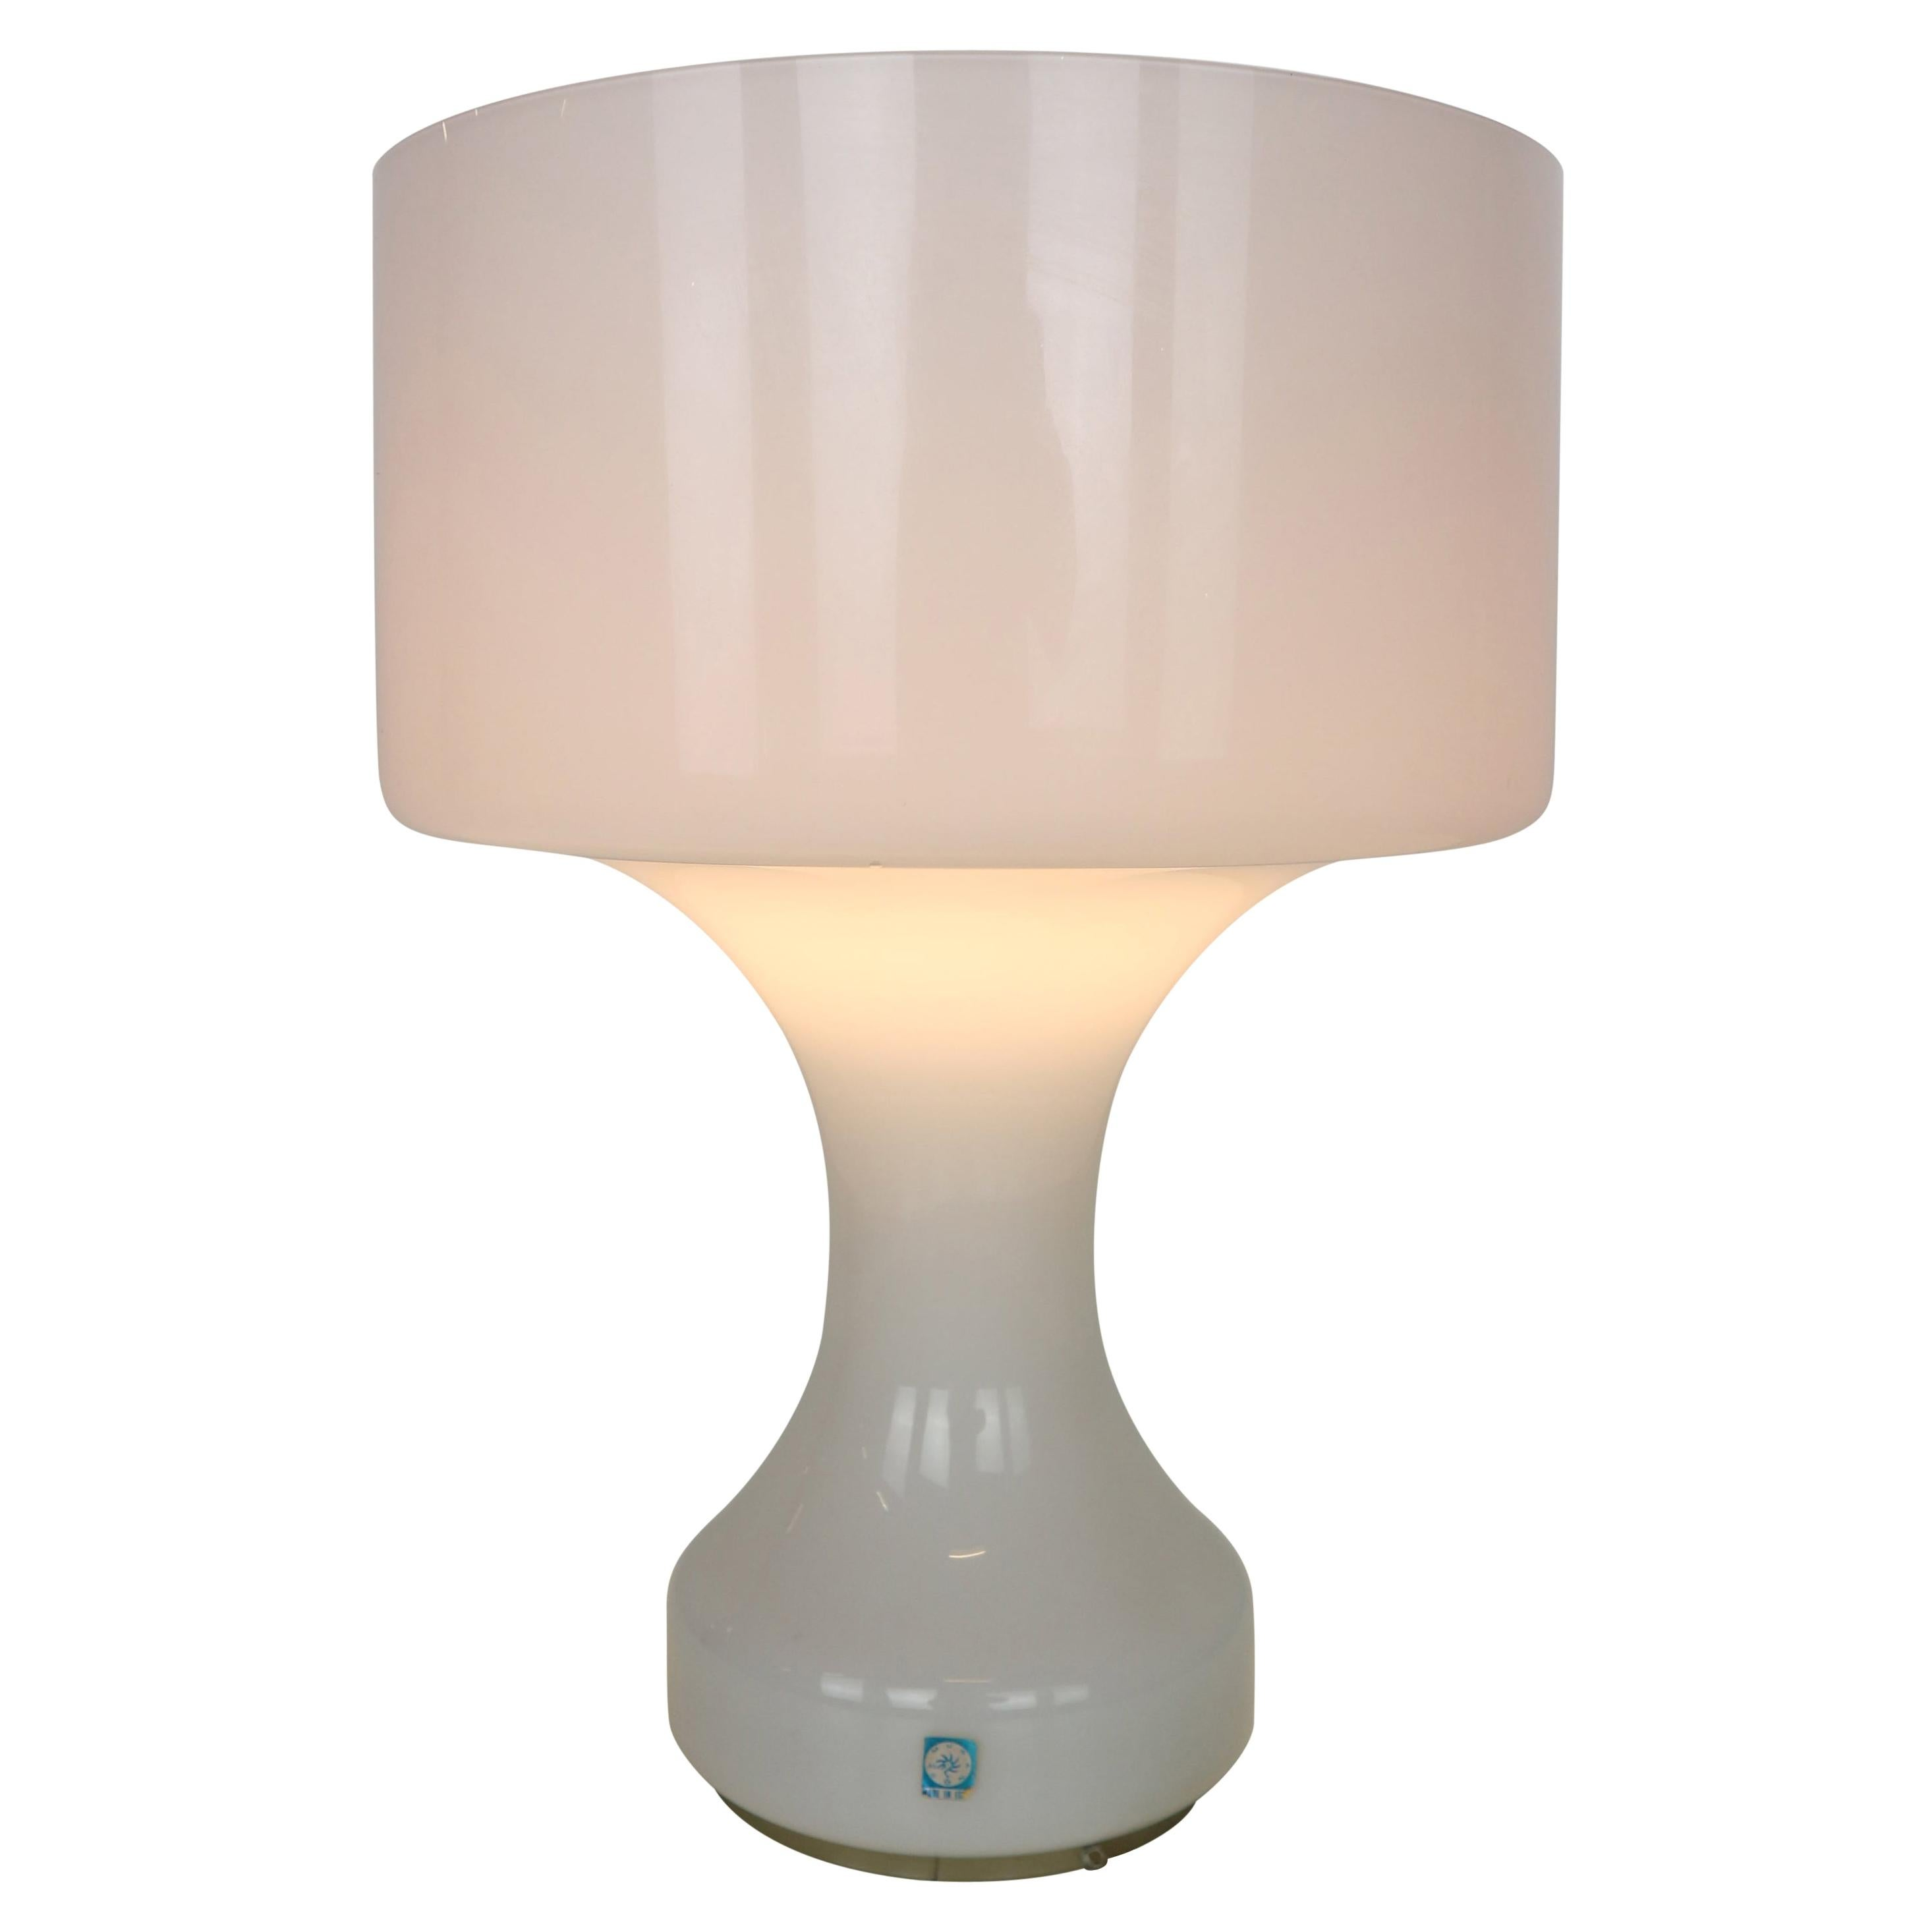 Snow White Murano Glass Table Lamp from Venini, 1960s